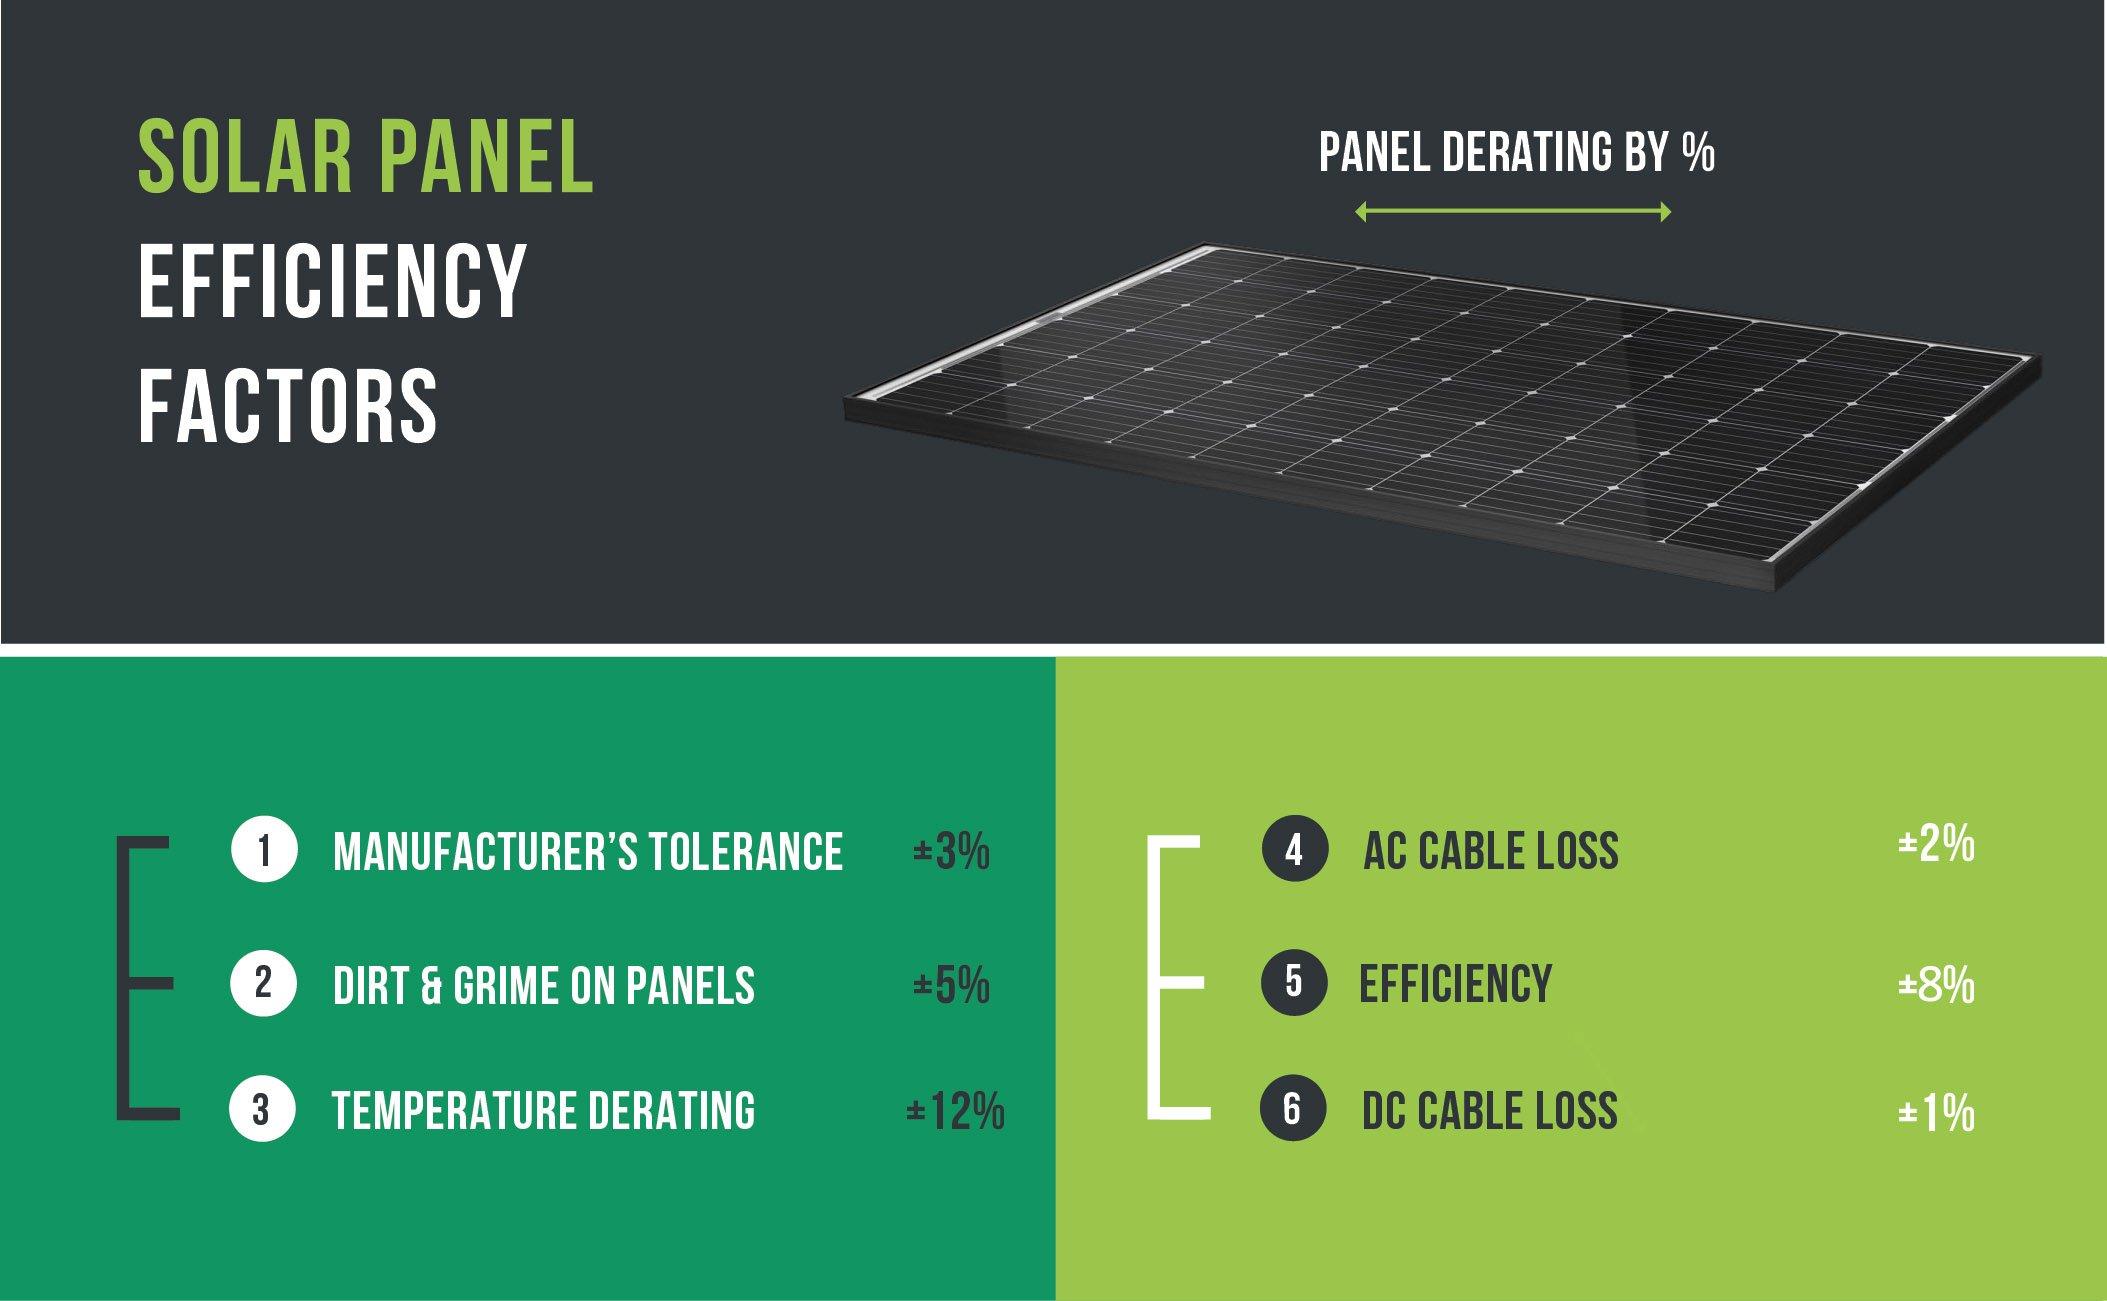 solar panel efficiency factors